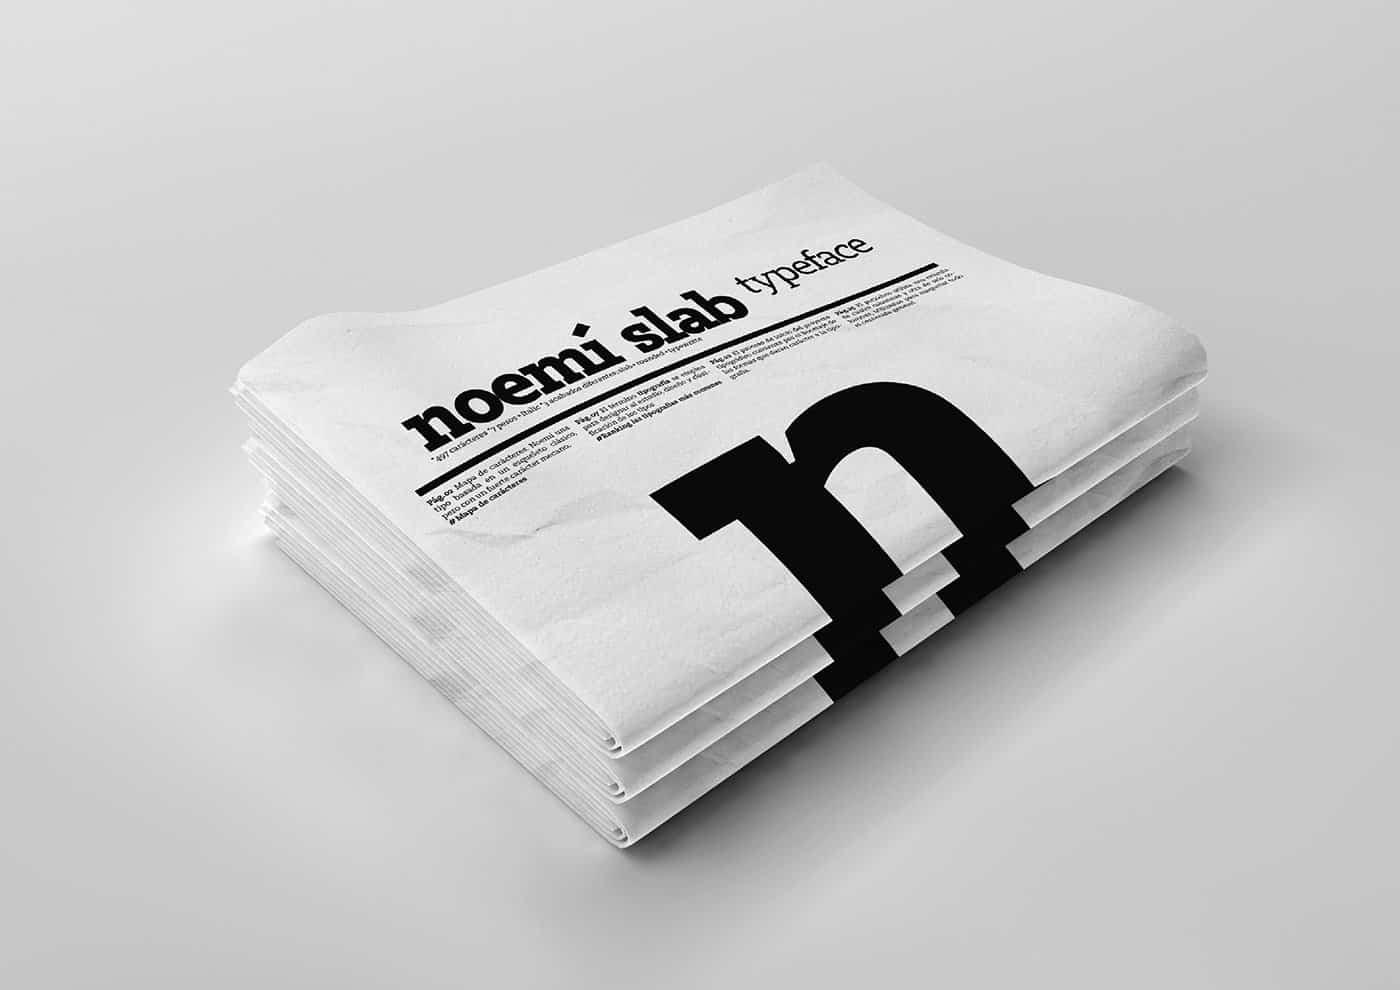 Noemí Slab Typeface